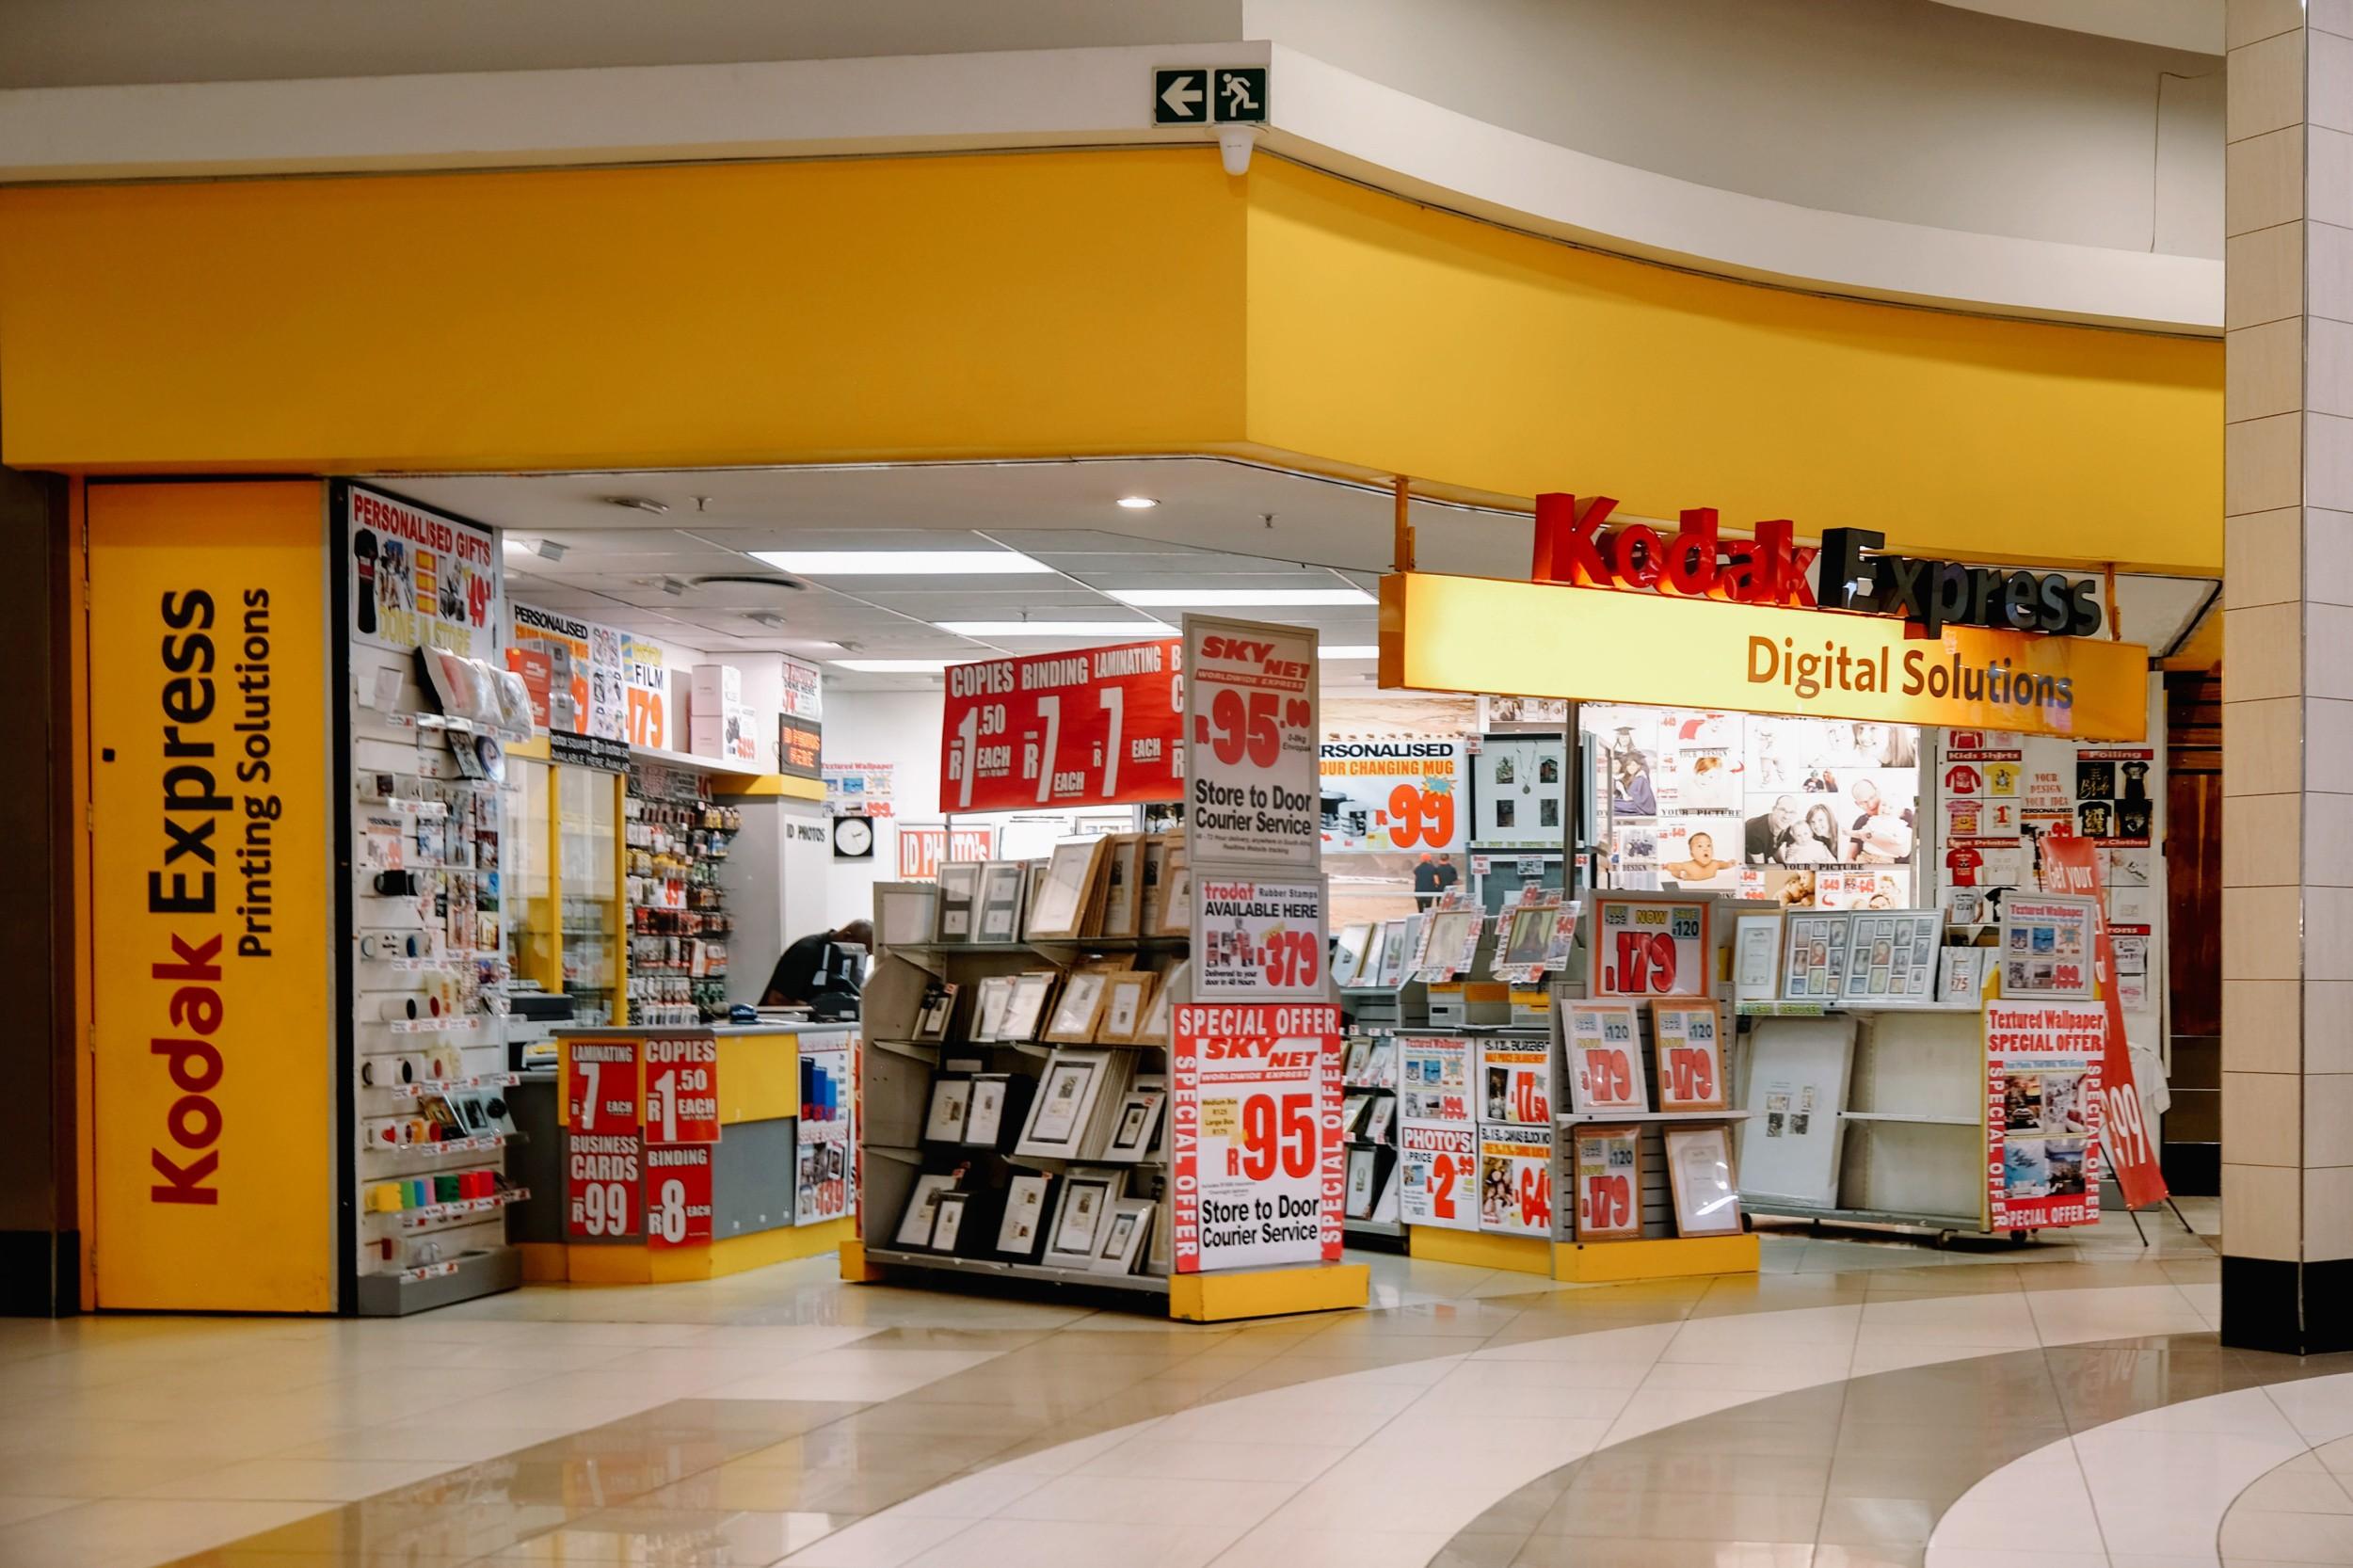 Kodak-Express-at-The-Grove-Mall